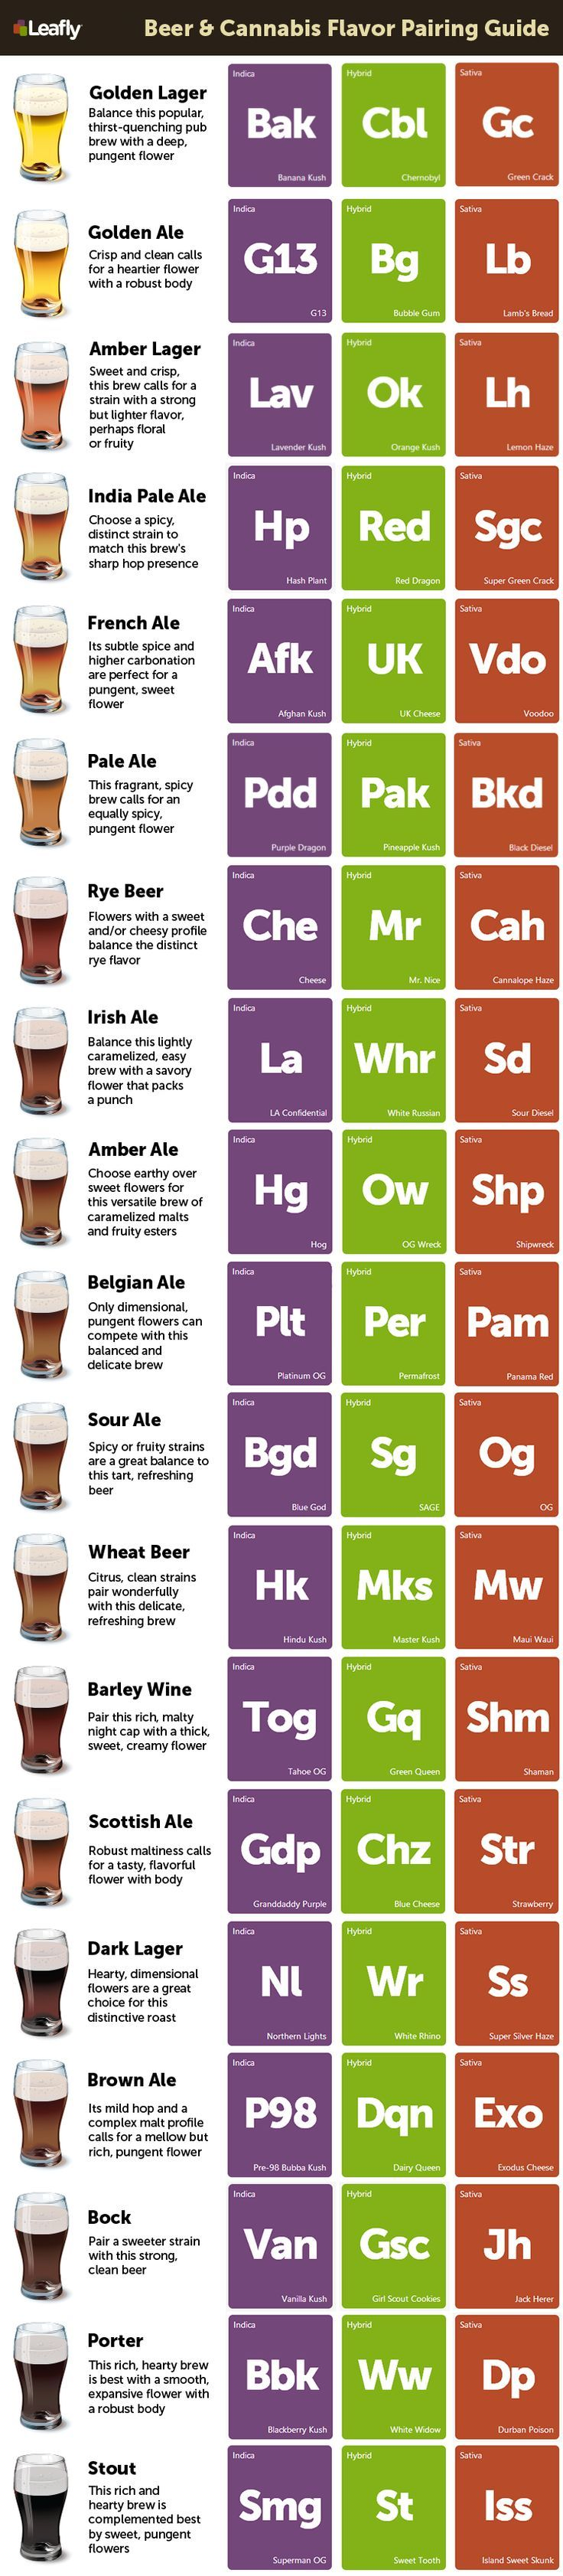 Beer & Cannabis Flavor Pairing Guide - Leafly  http://hanfsamenkaufenlegal.com